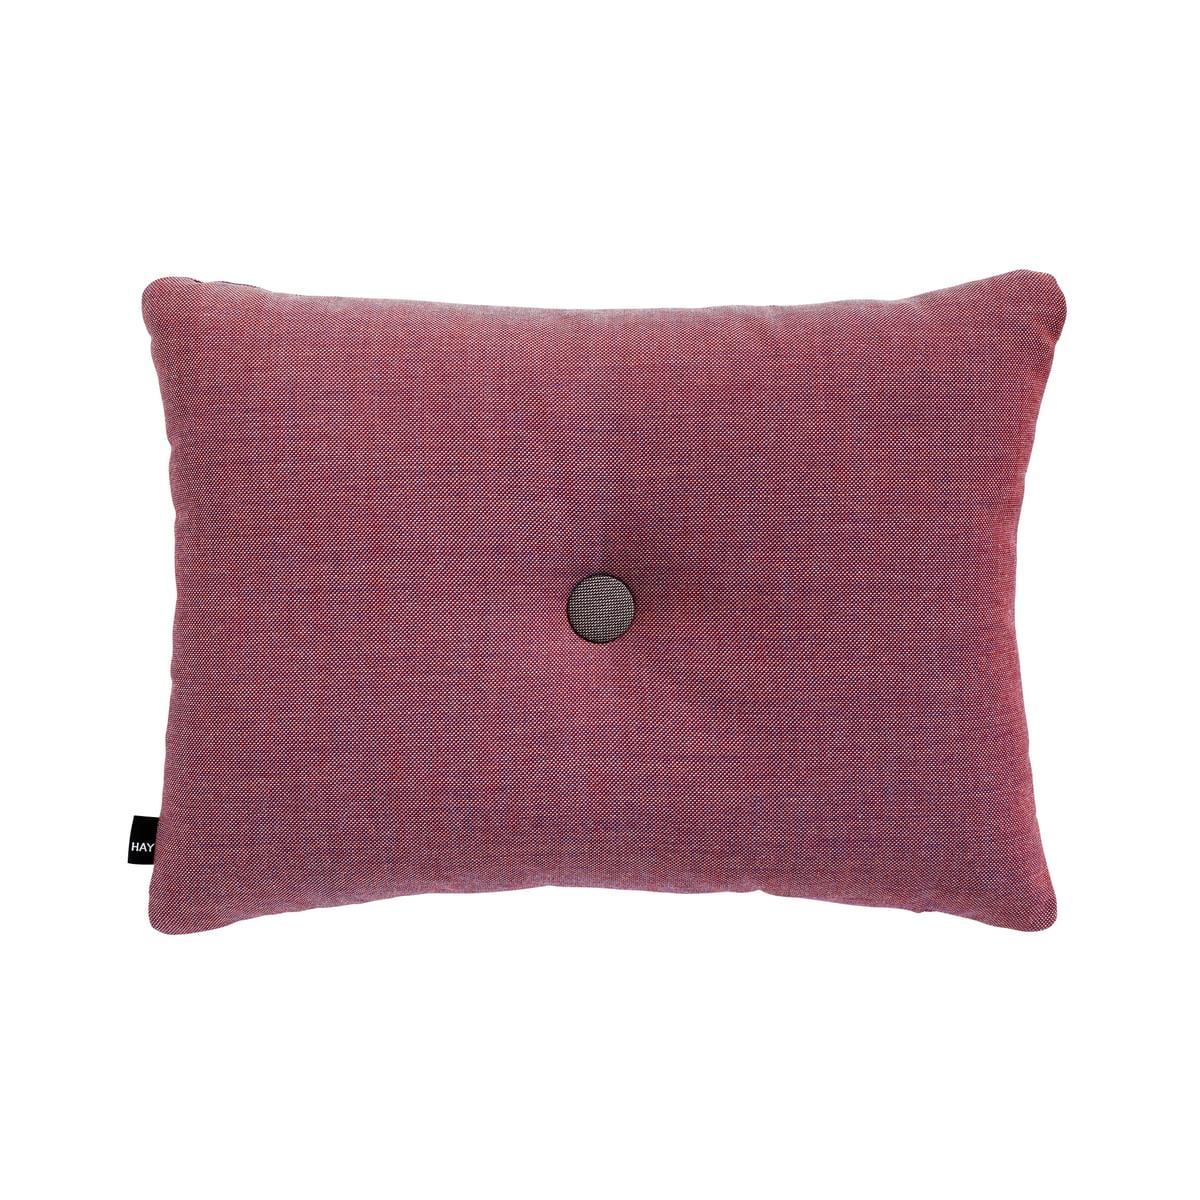 hay dot cushion surface. Black Bedroom Furniture Sets. Home Design Ideas